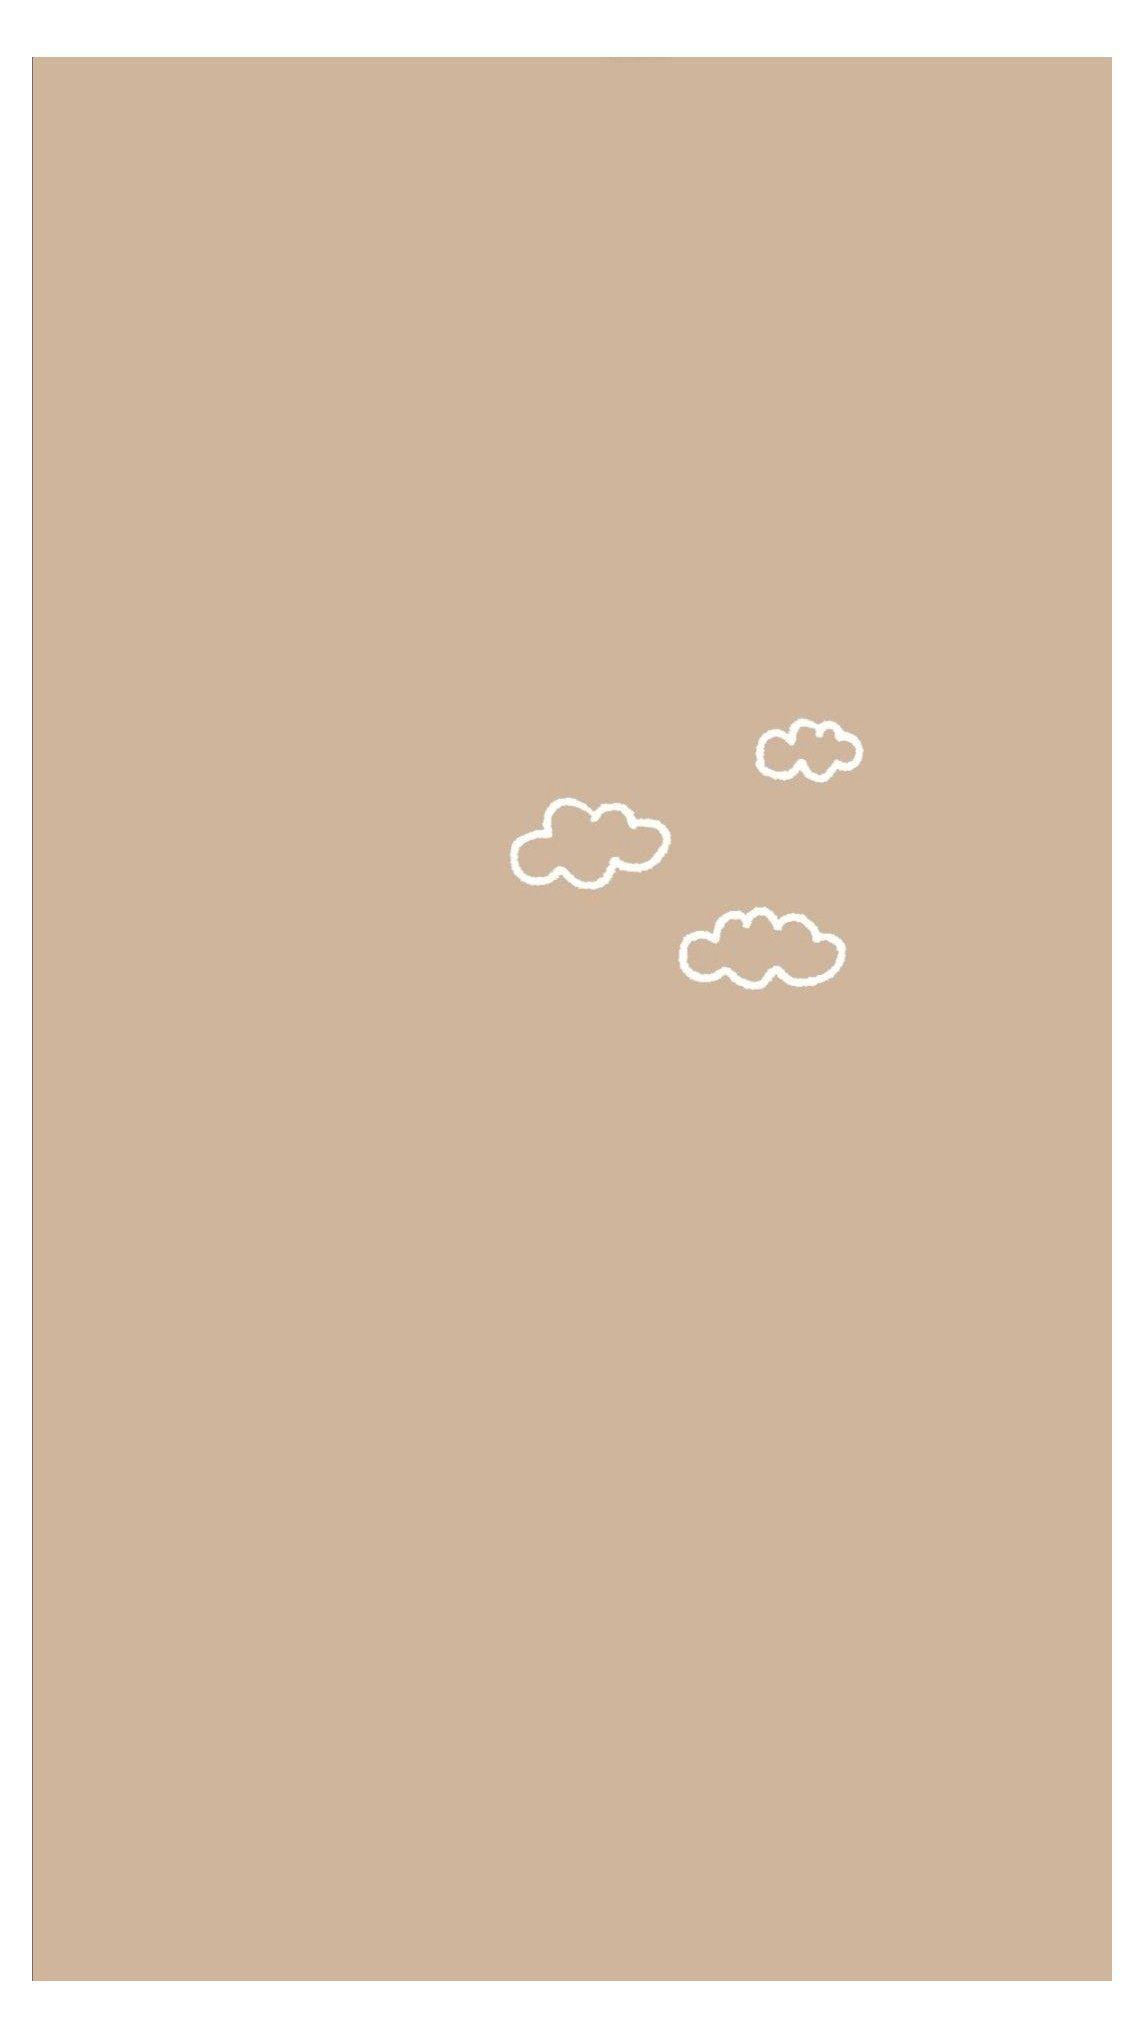 minimalist aesthetic wallpaper